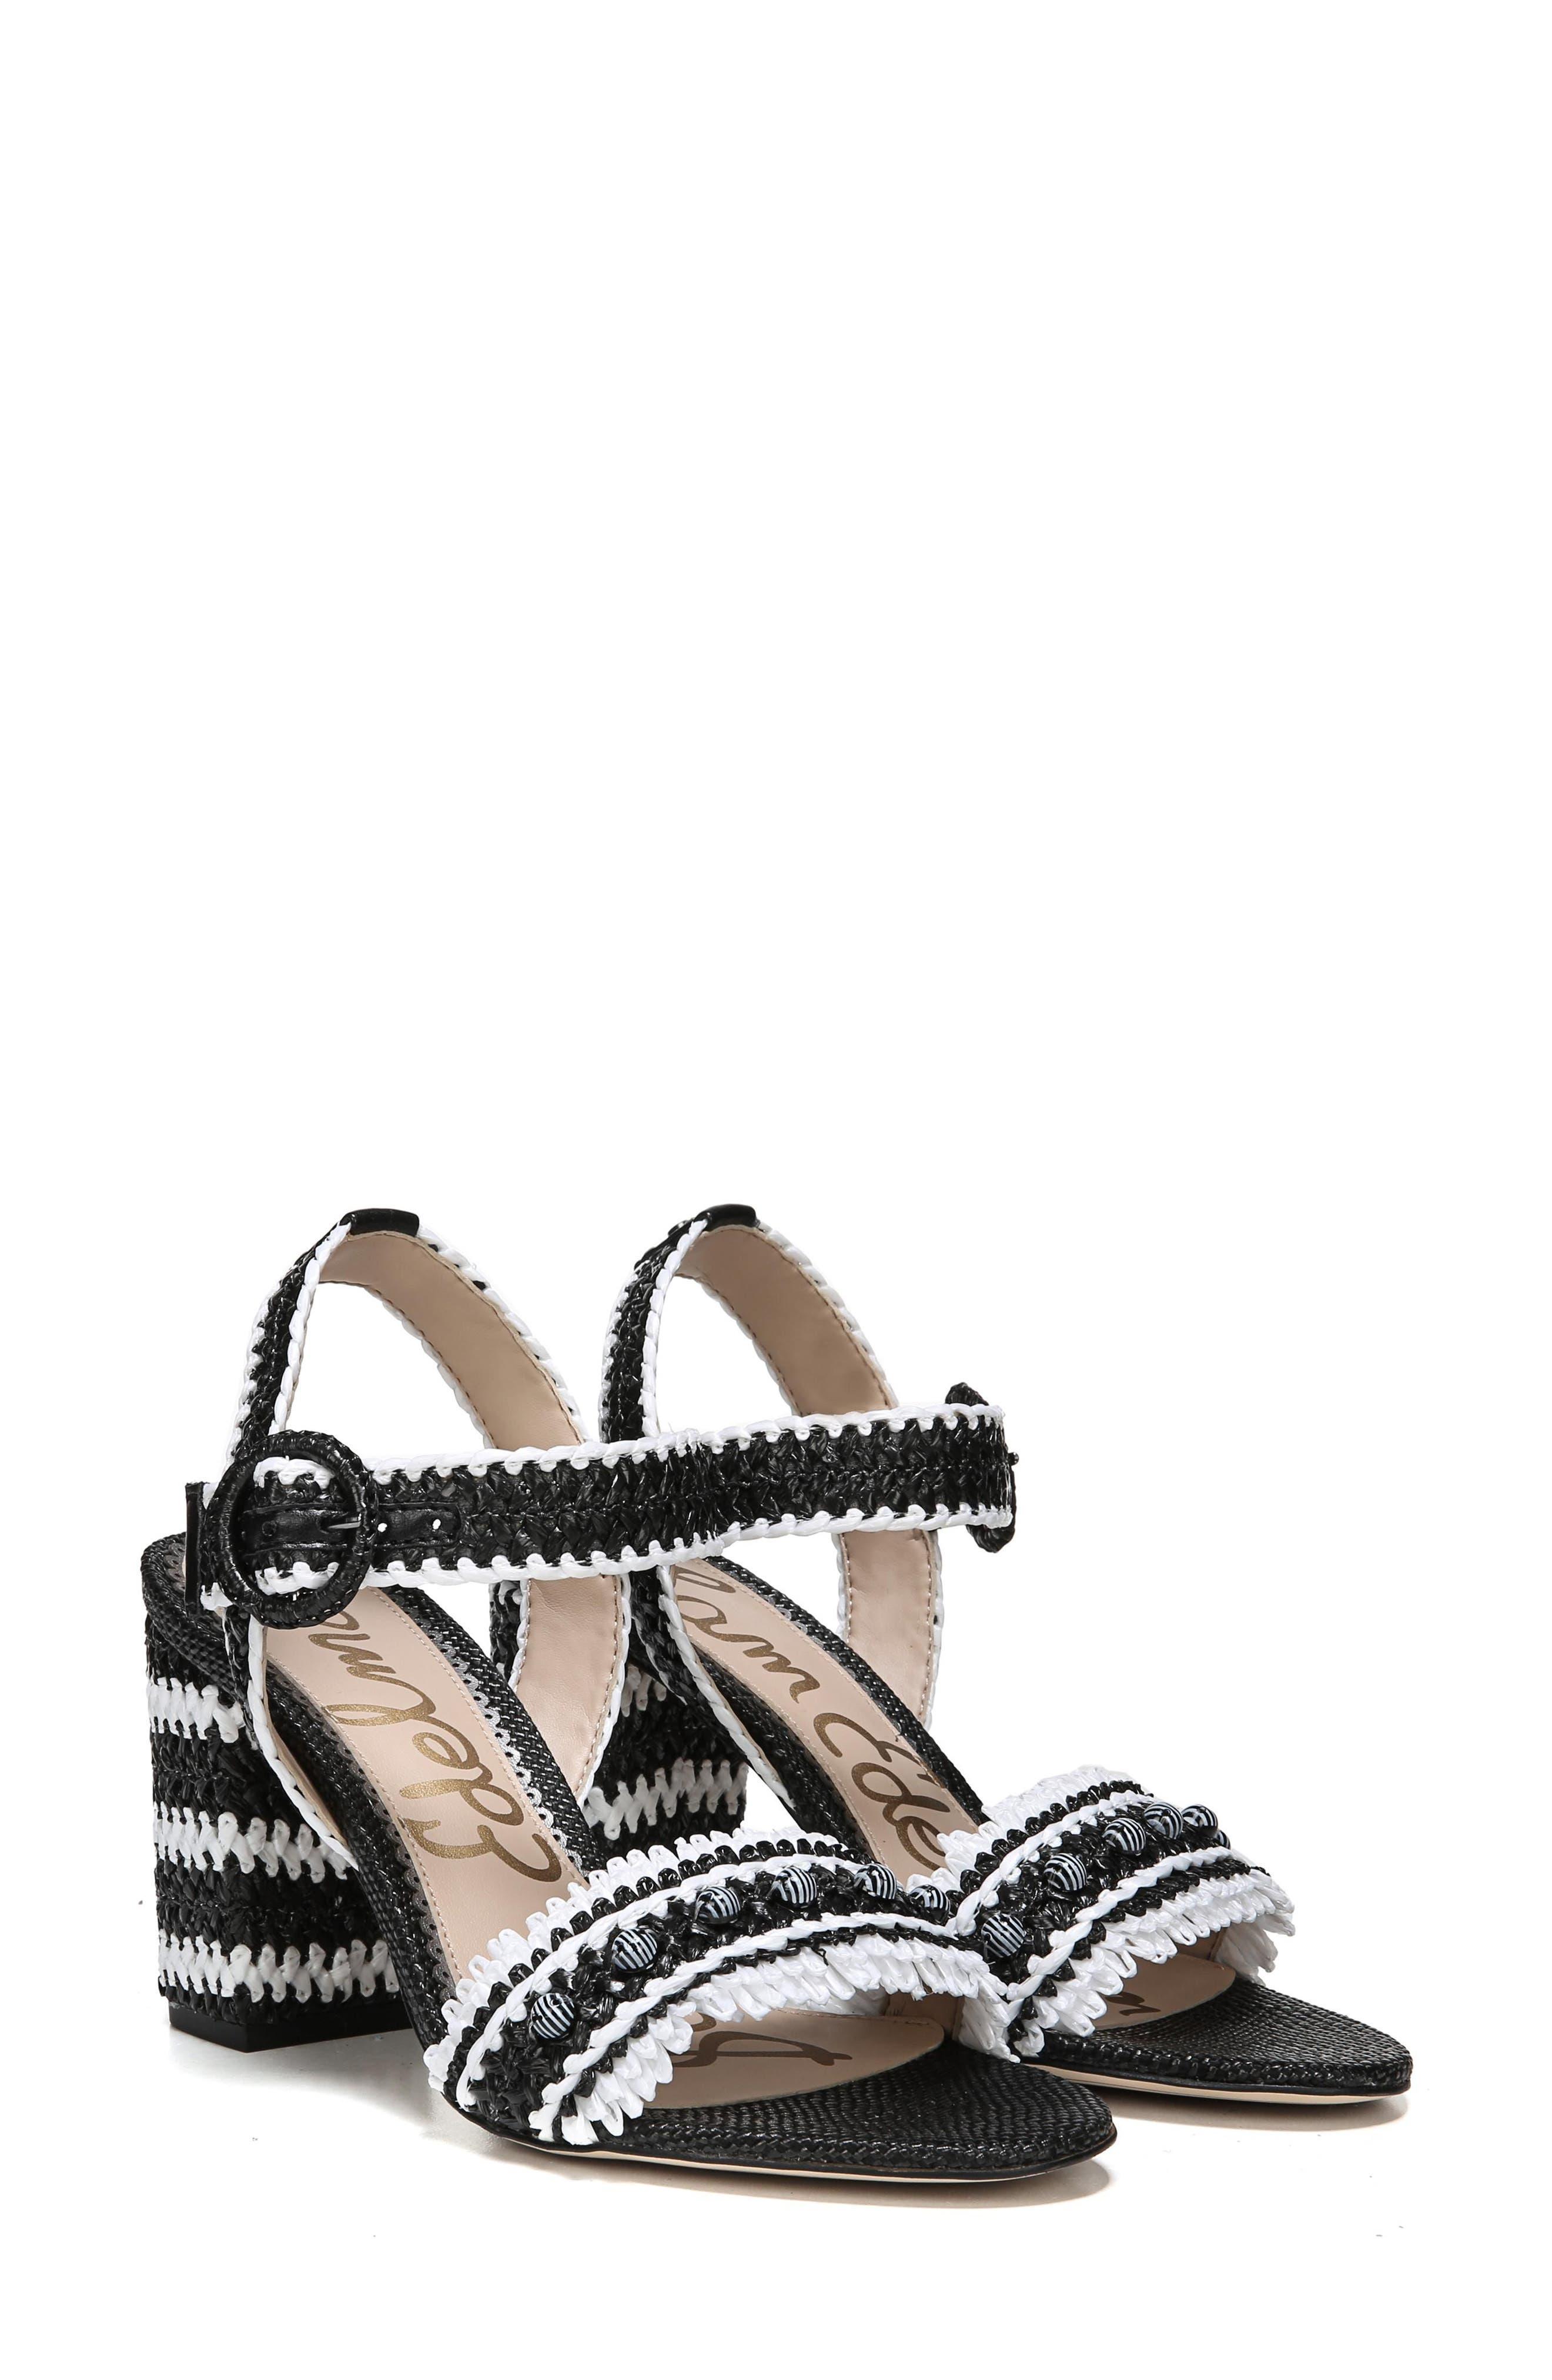 Olisa Block Heel Sandal,                             Alternate thumbnail 8, color,                             001